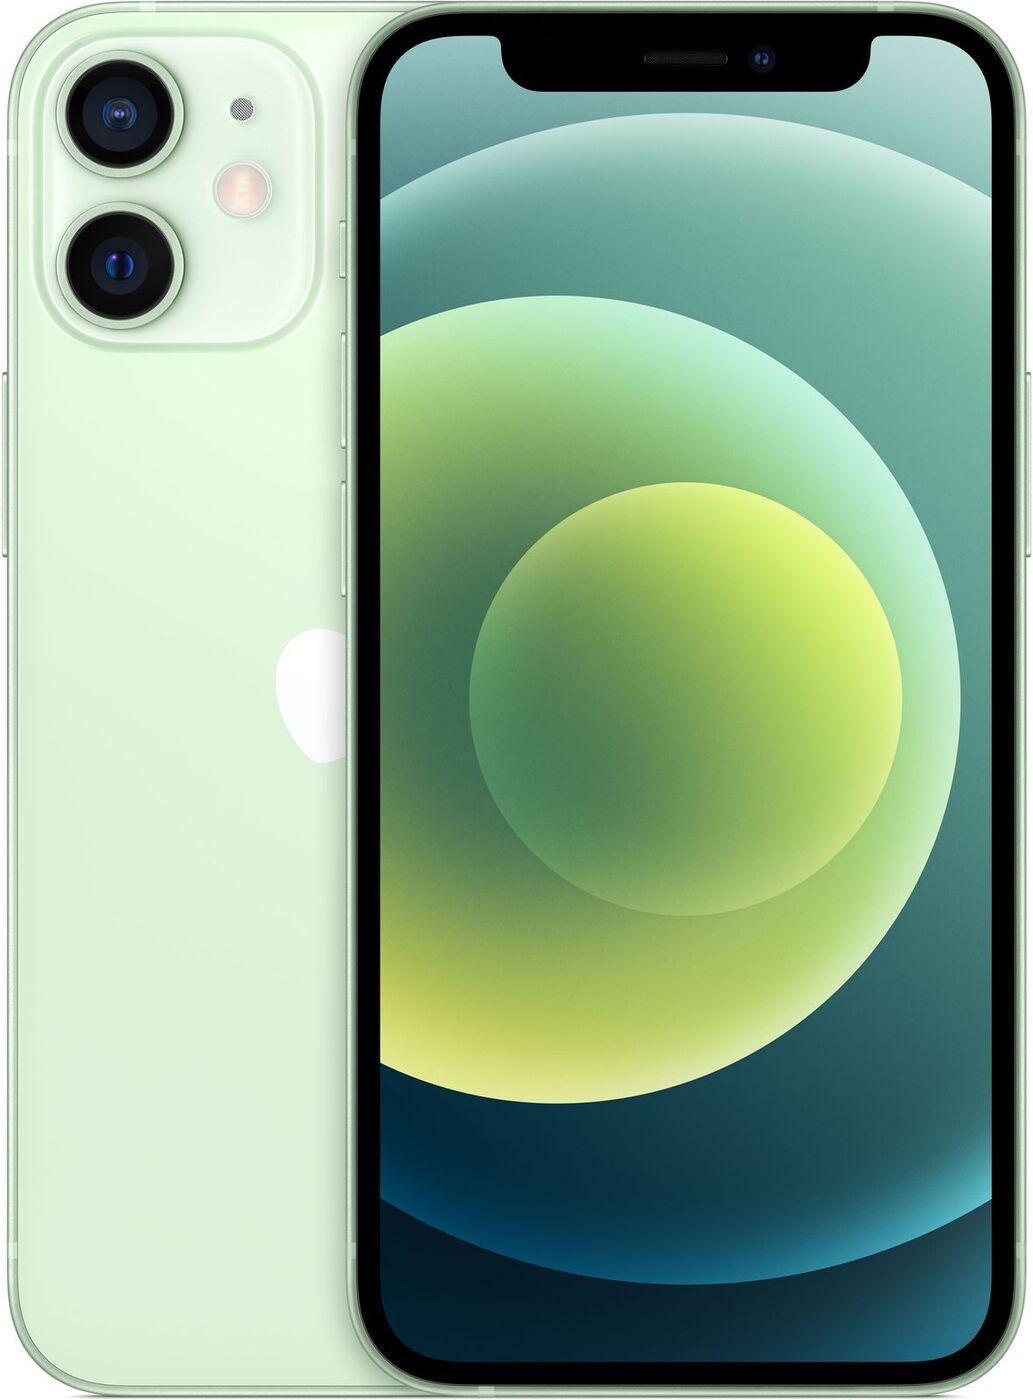 смартфон apple iphone 12 mini 64gb, зеленый